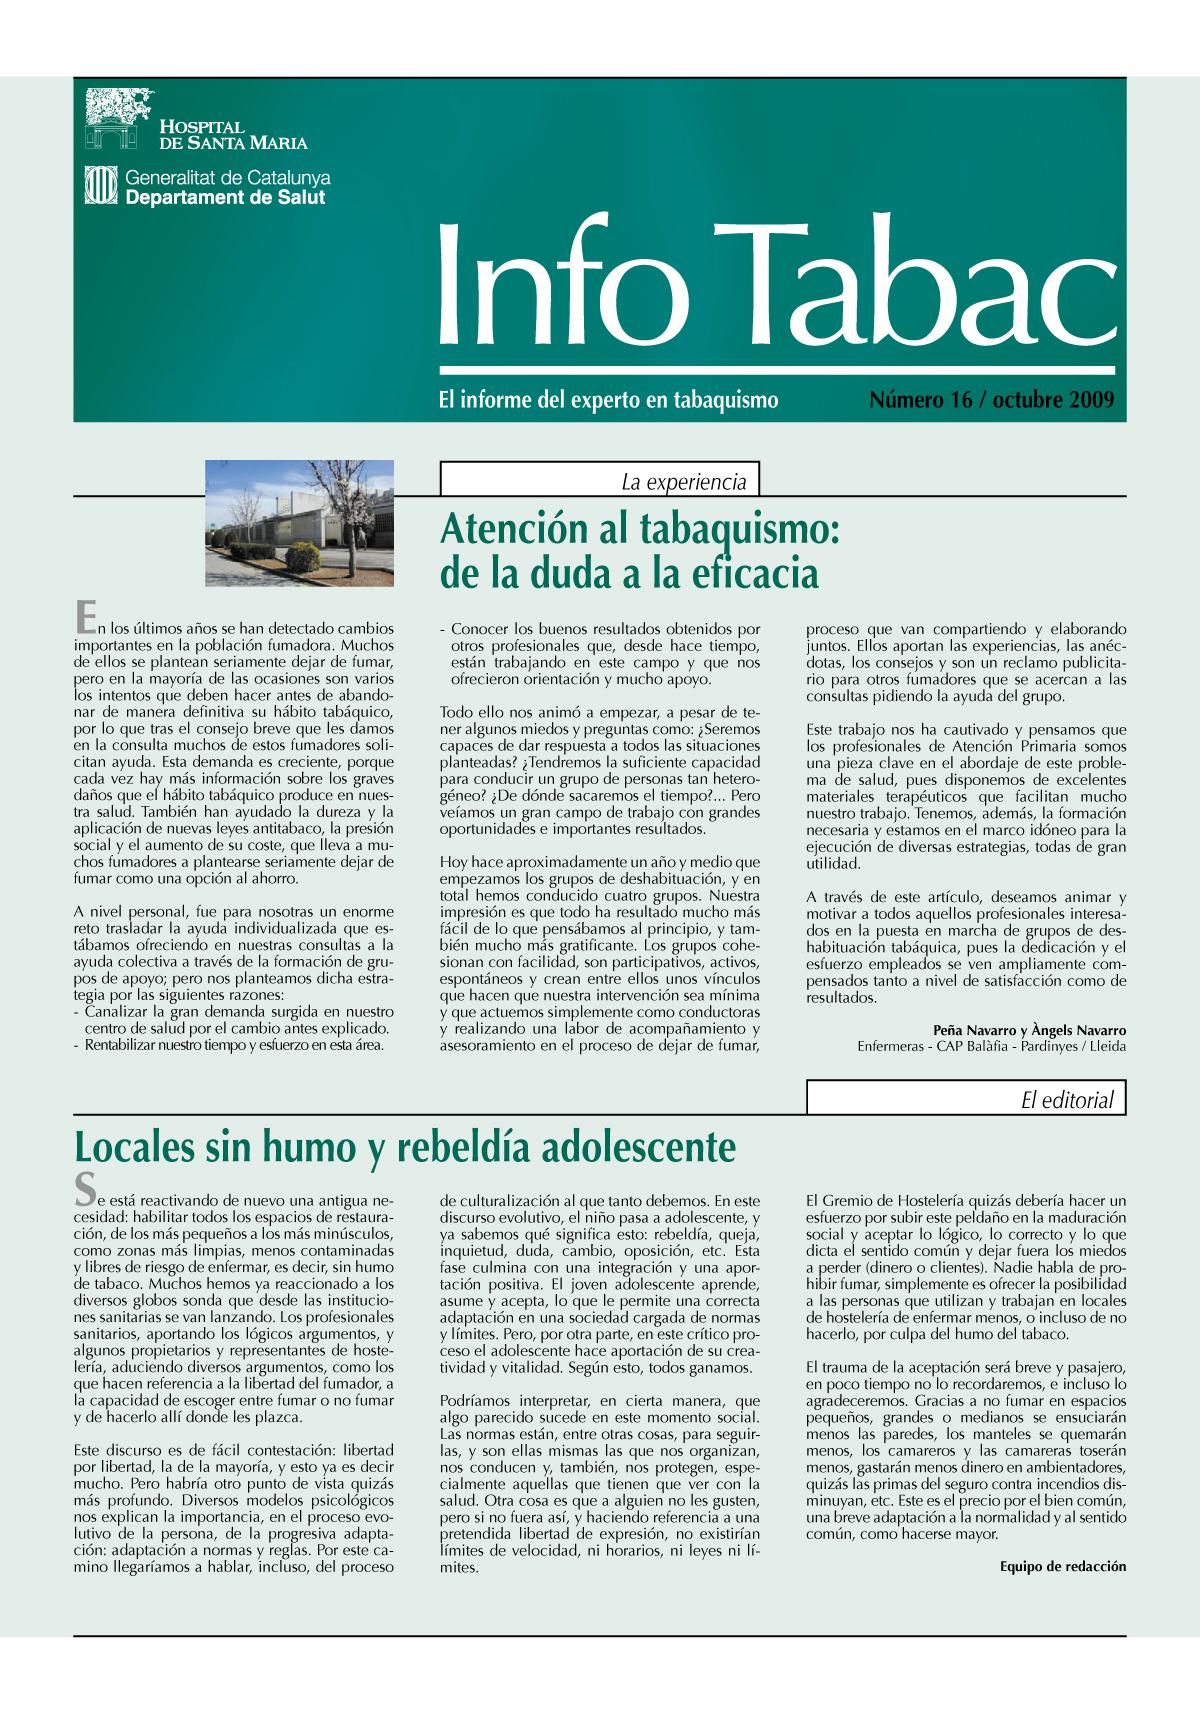 Info Tabac nº16 - Octubre 2009